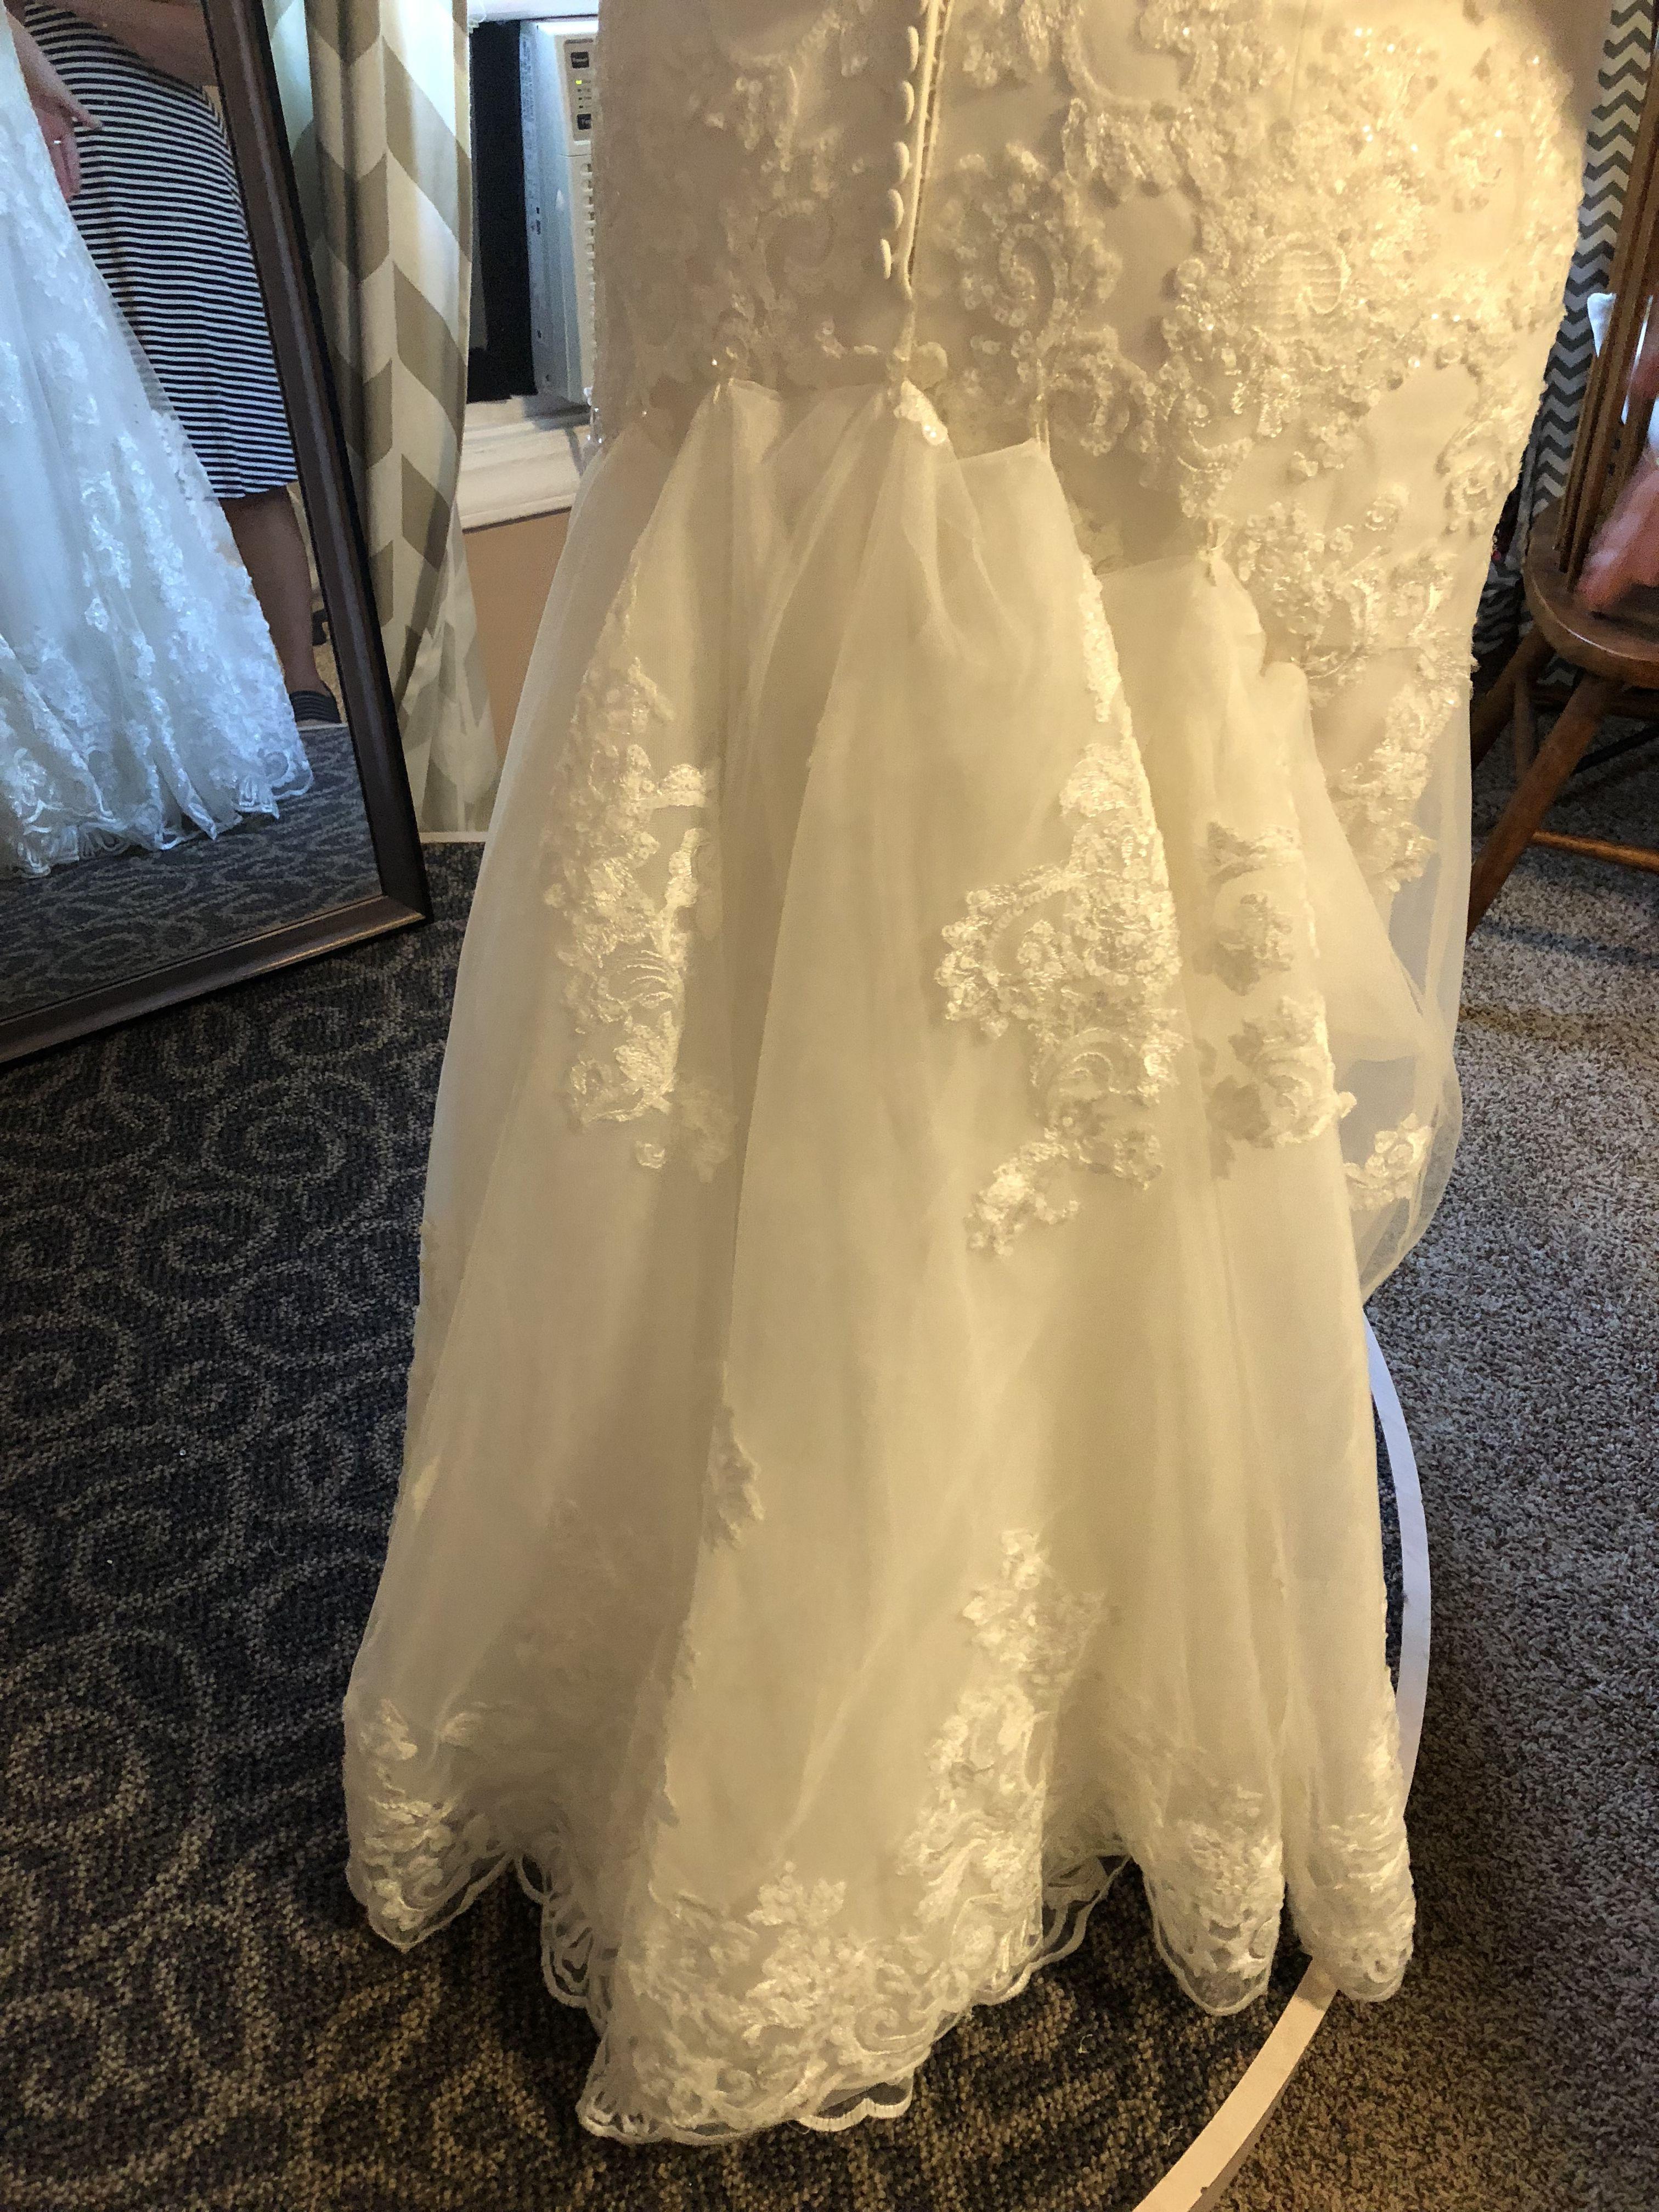 The bustle wedding dresses  Over bustle Jess designs  bustles  Pinterest  Bustle Wedding